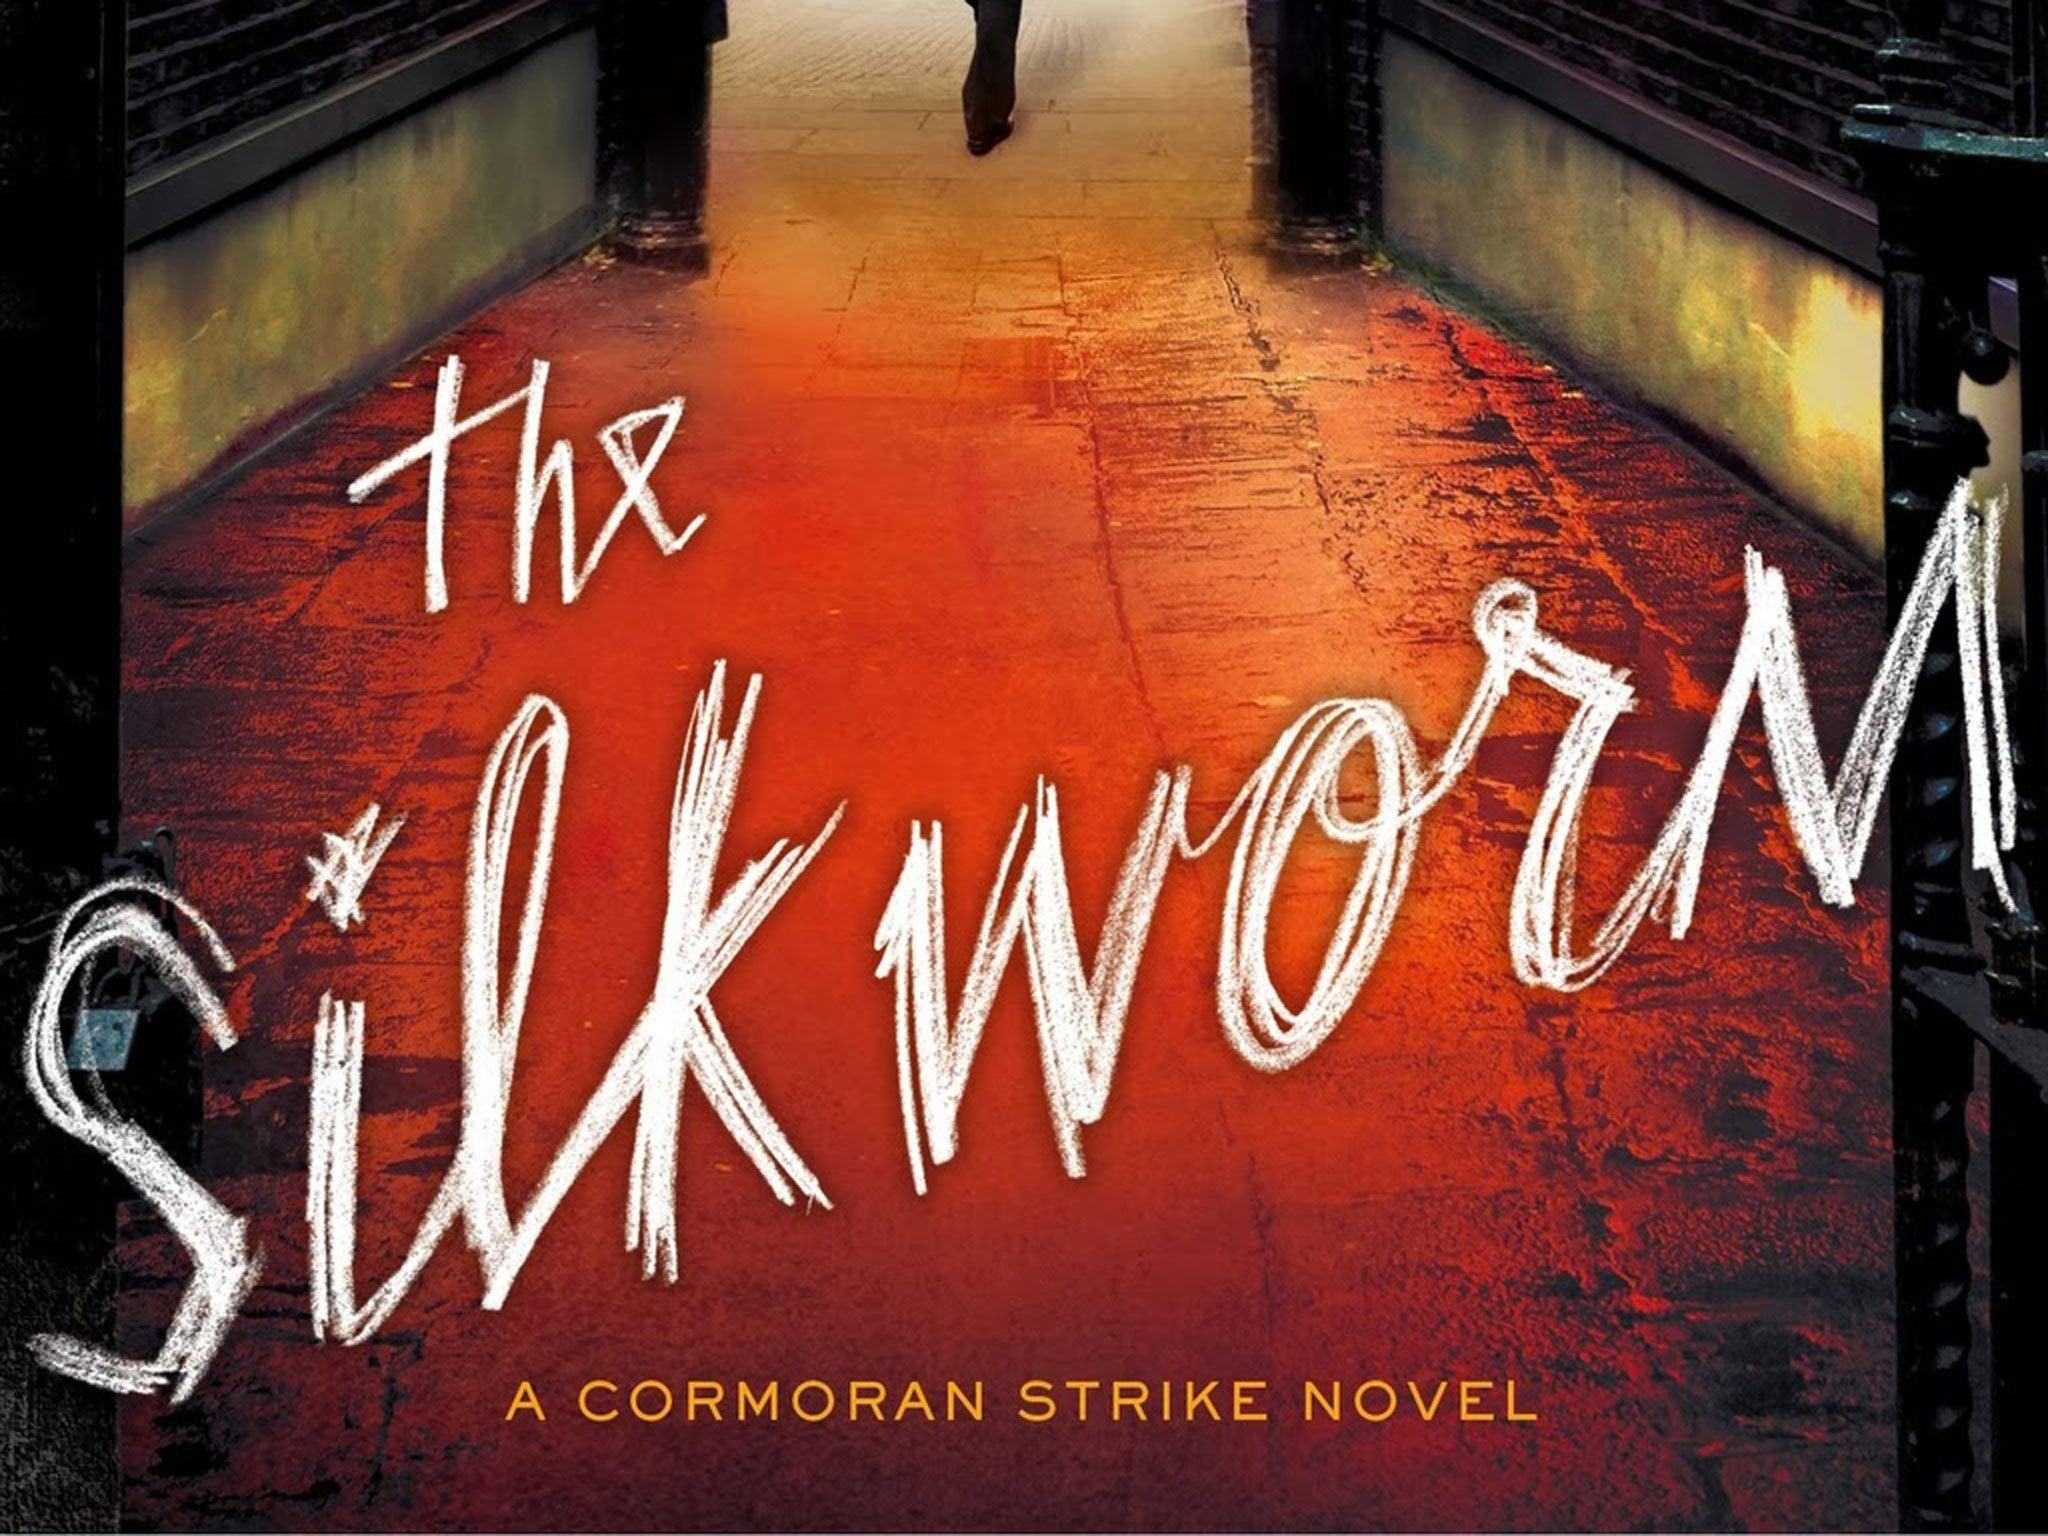 JK Rowling to release new novel The Silkworm under Robert Galbraith pseudonym